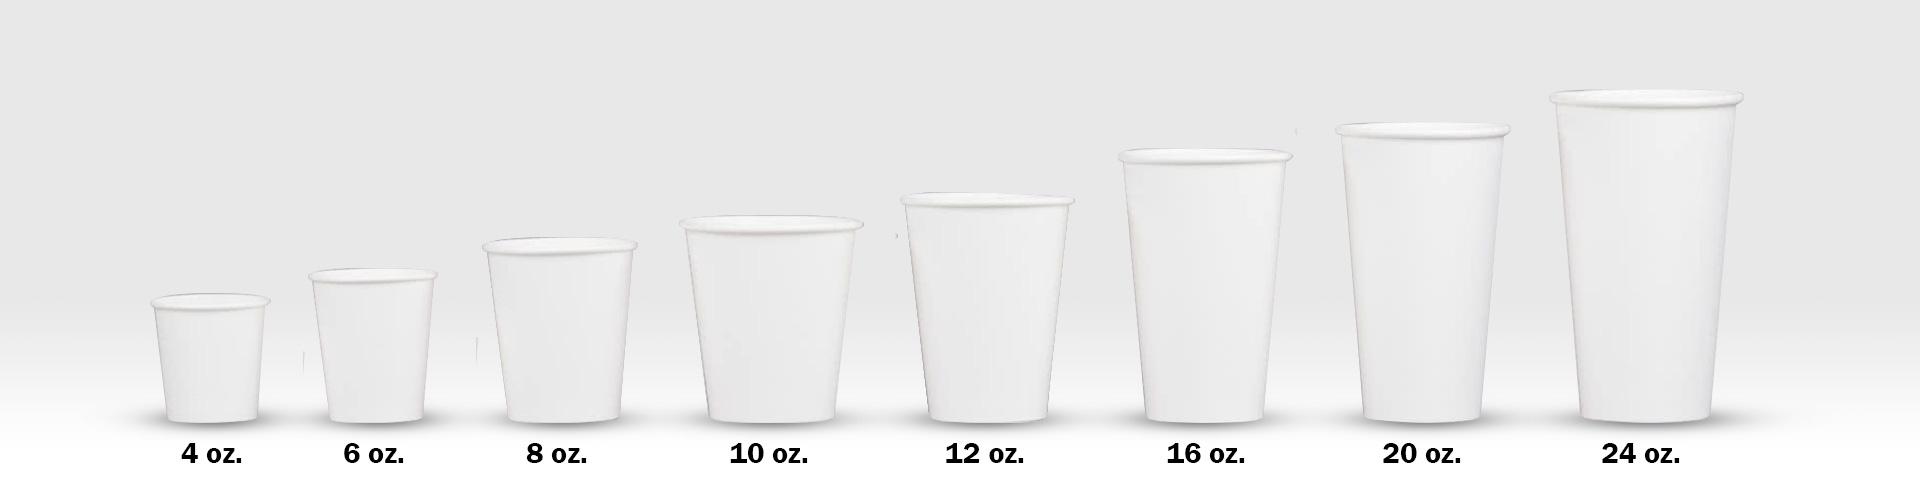 JM - Tamaños vasos para café